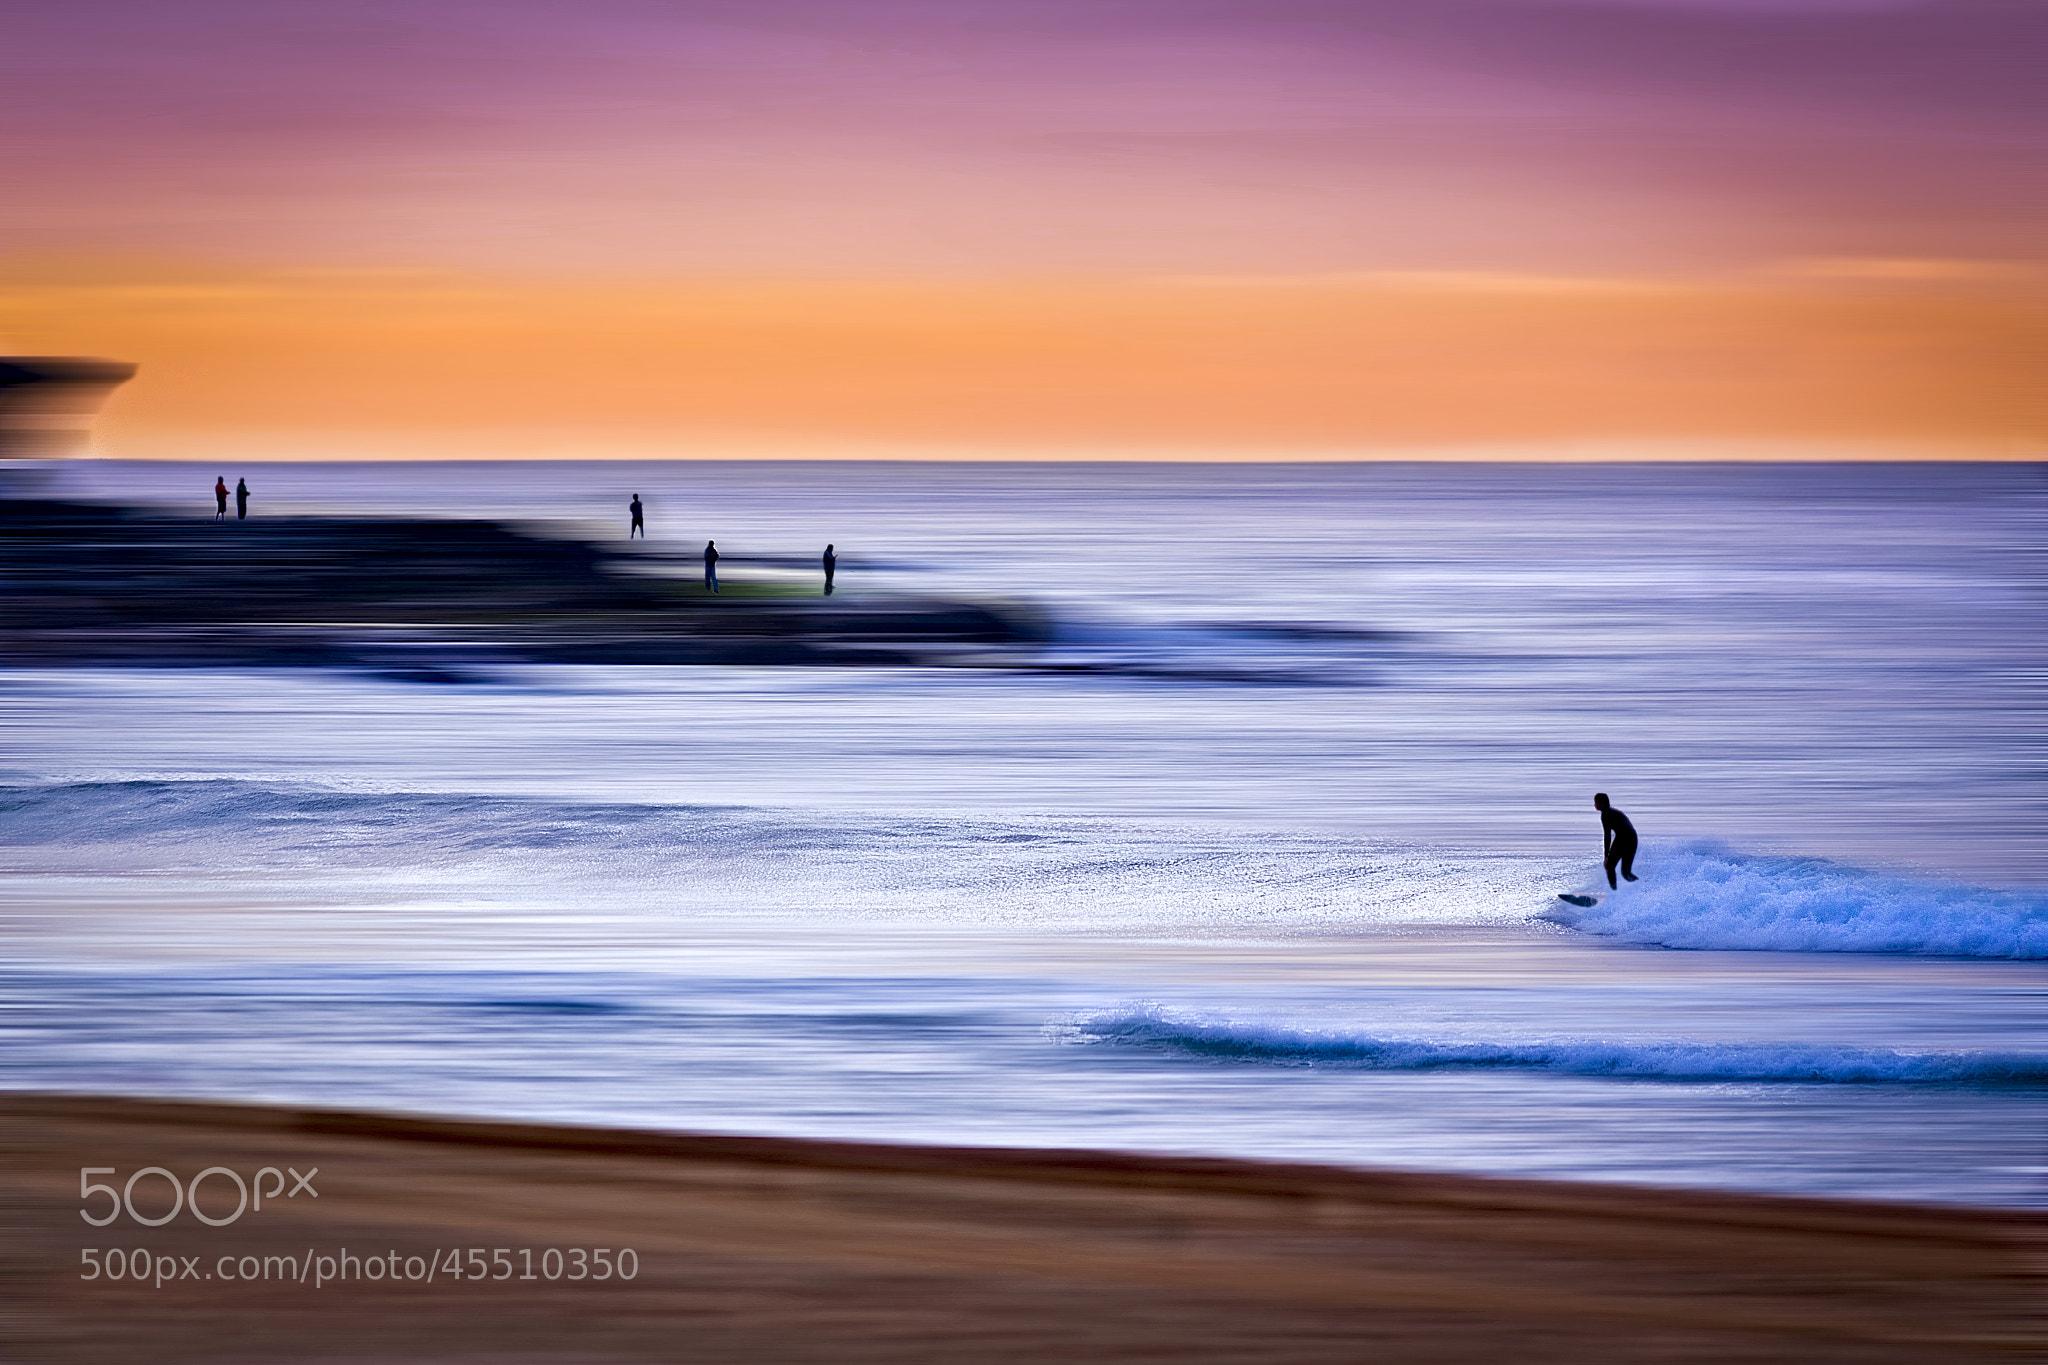 Photograph Pastel Dawn by David Psaila on 500px